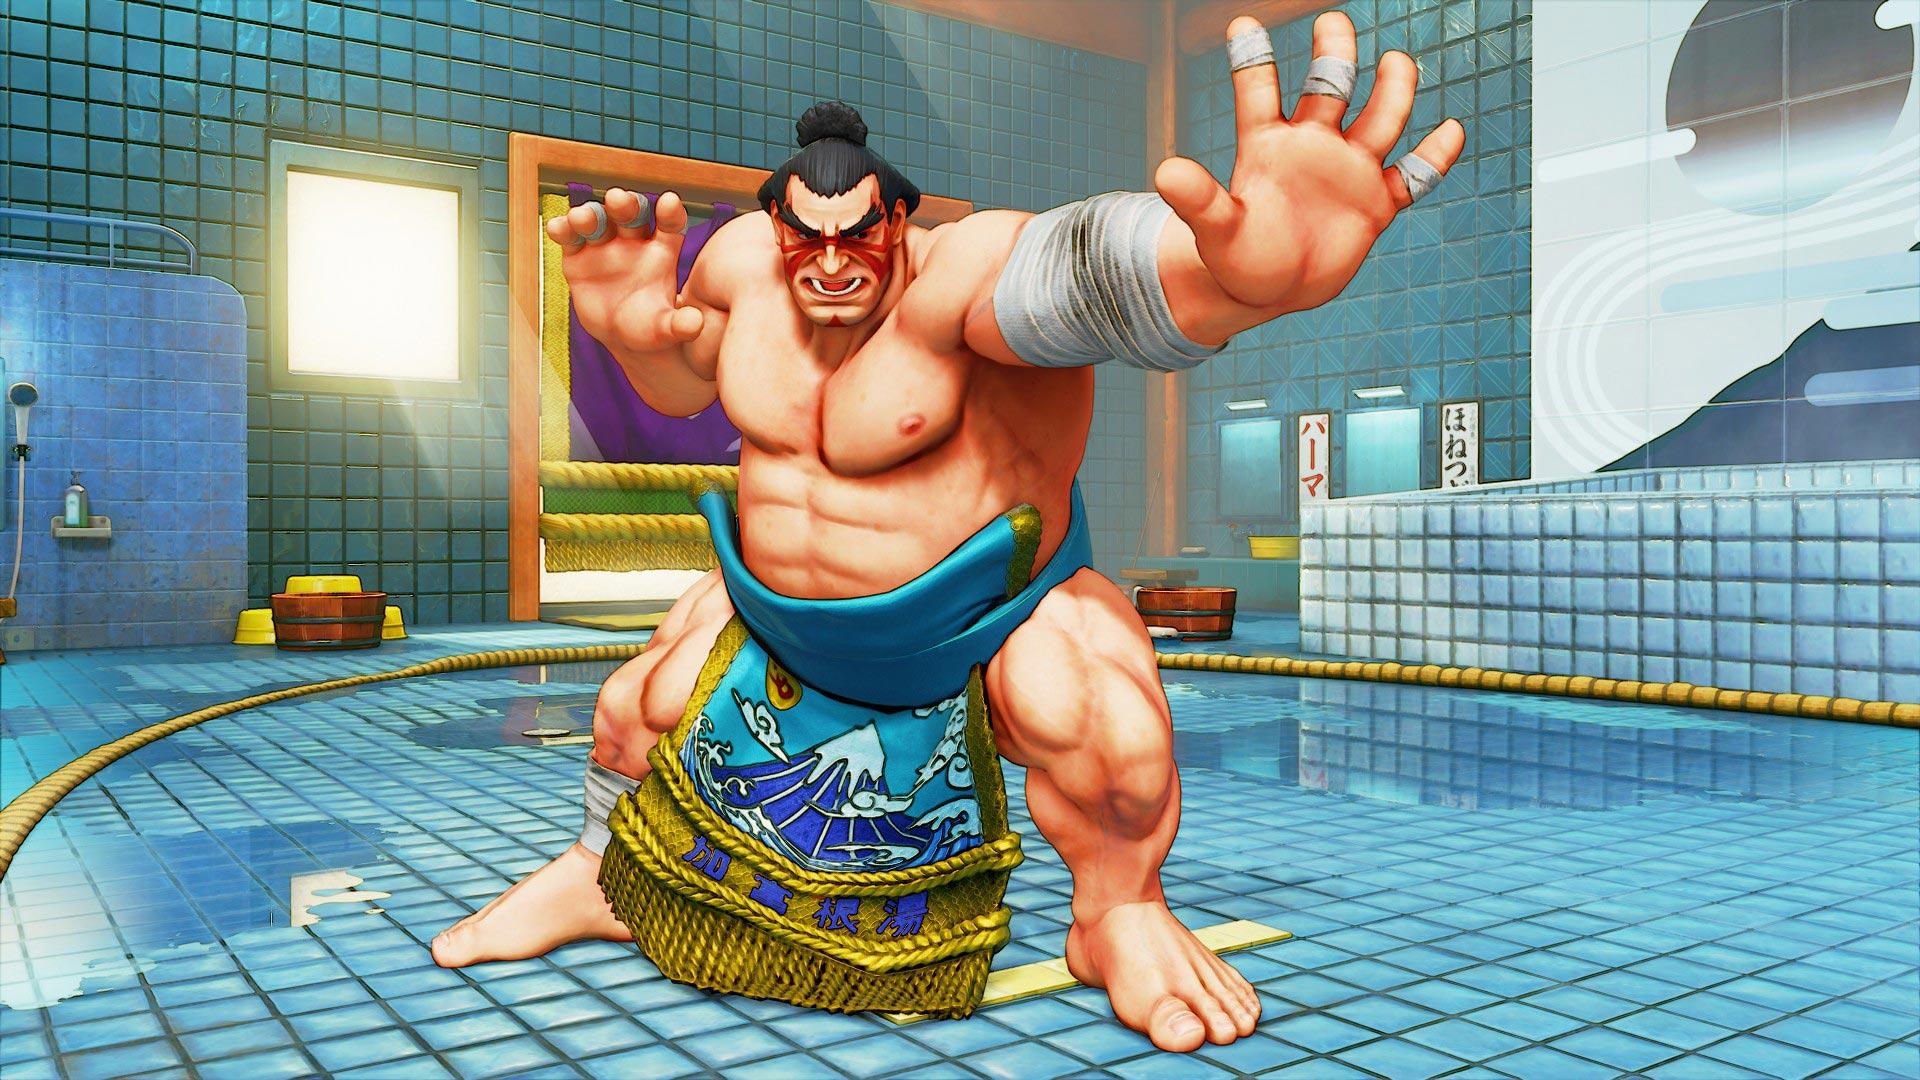 Street Fighter 5 Summer bundle DLC screenshots 2 out of 8 image gallery